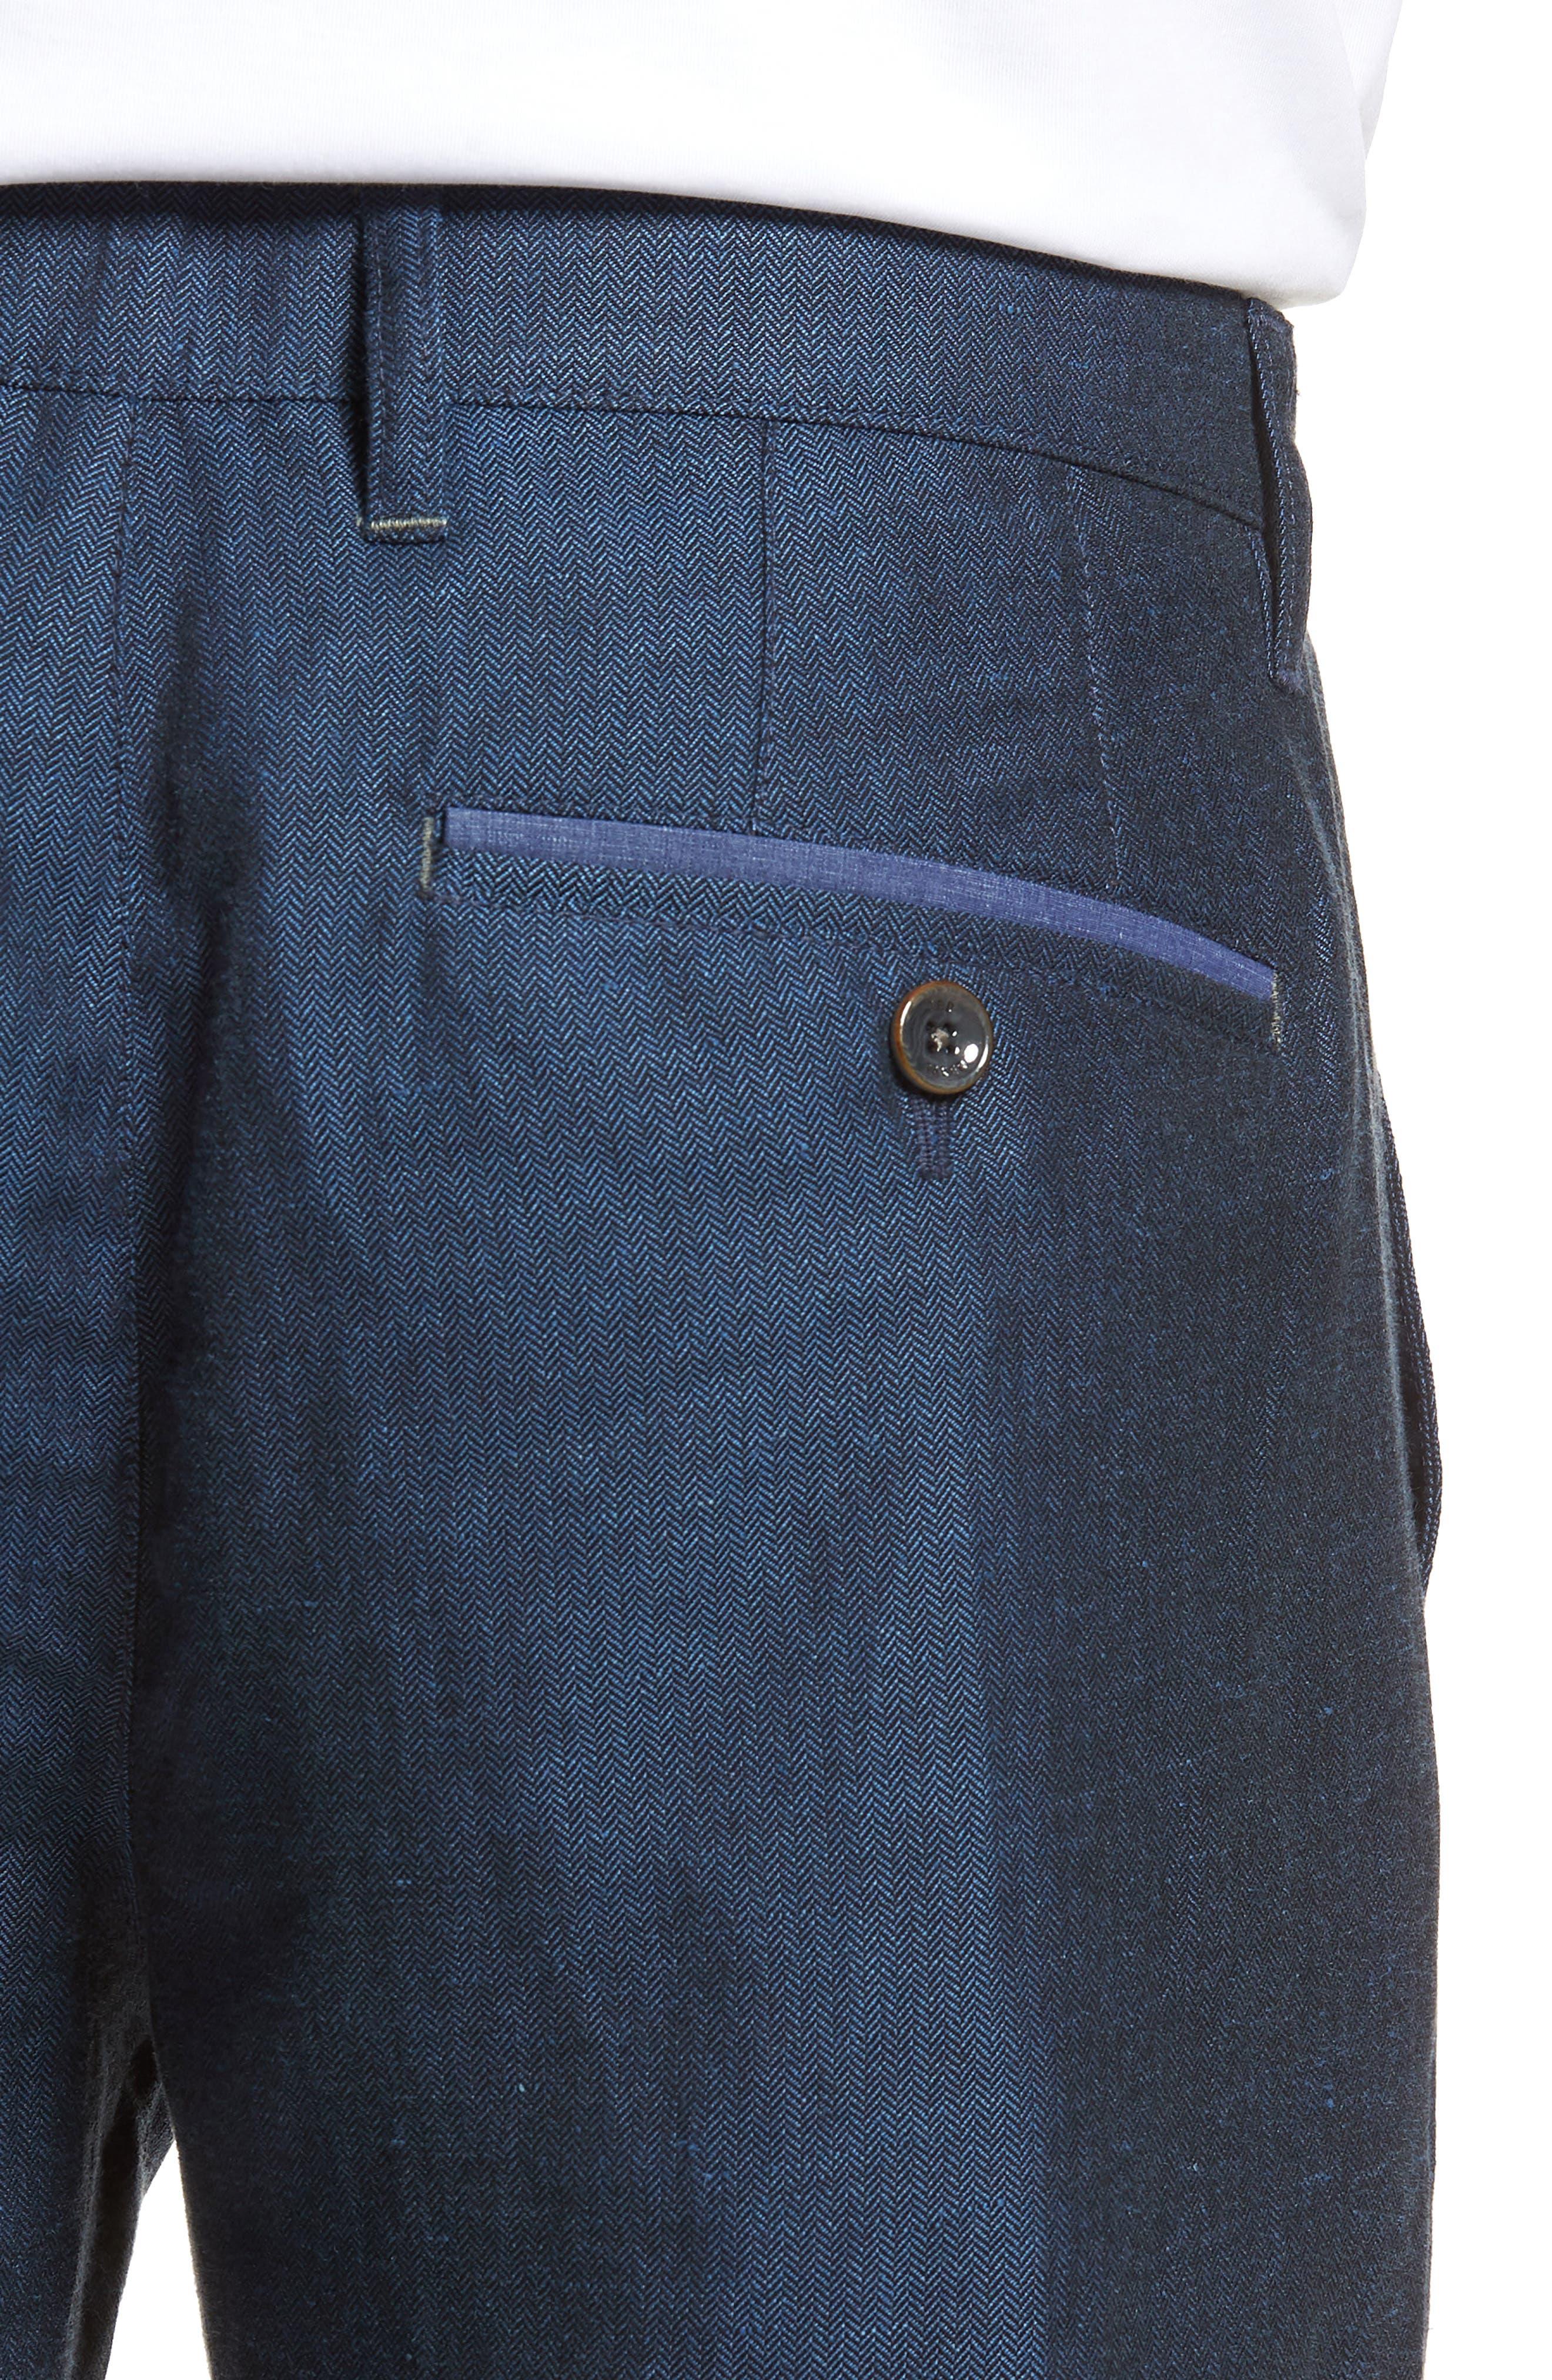 Cazzman Flat Front Stretch Pants,                             Alternate thumbnail 4, color,                             Navy